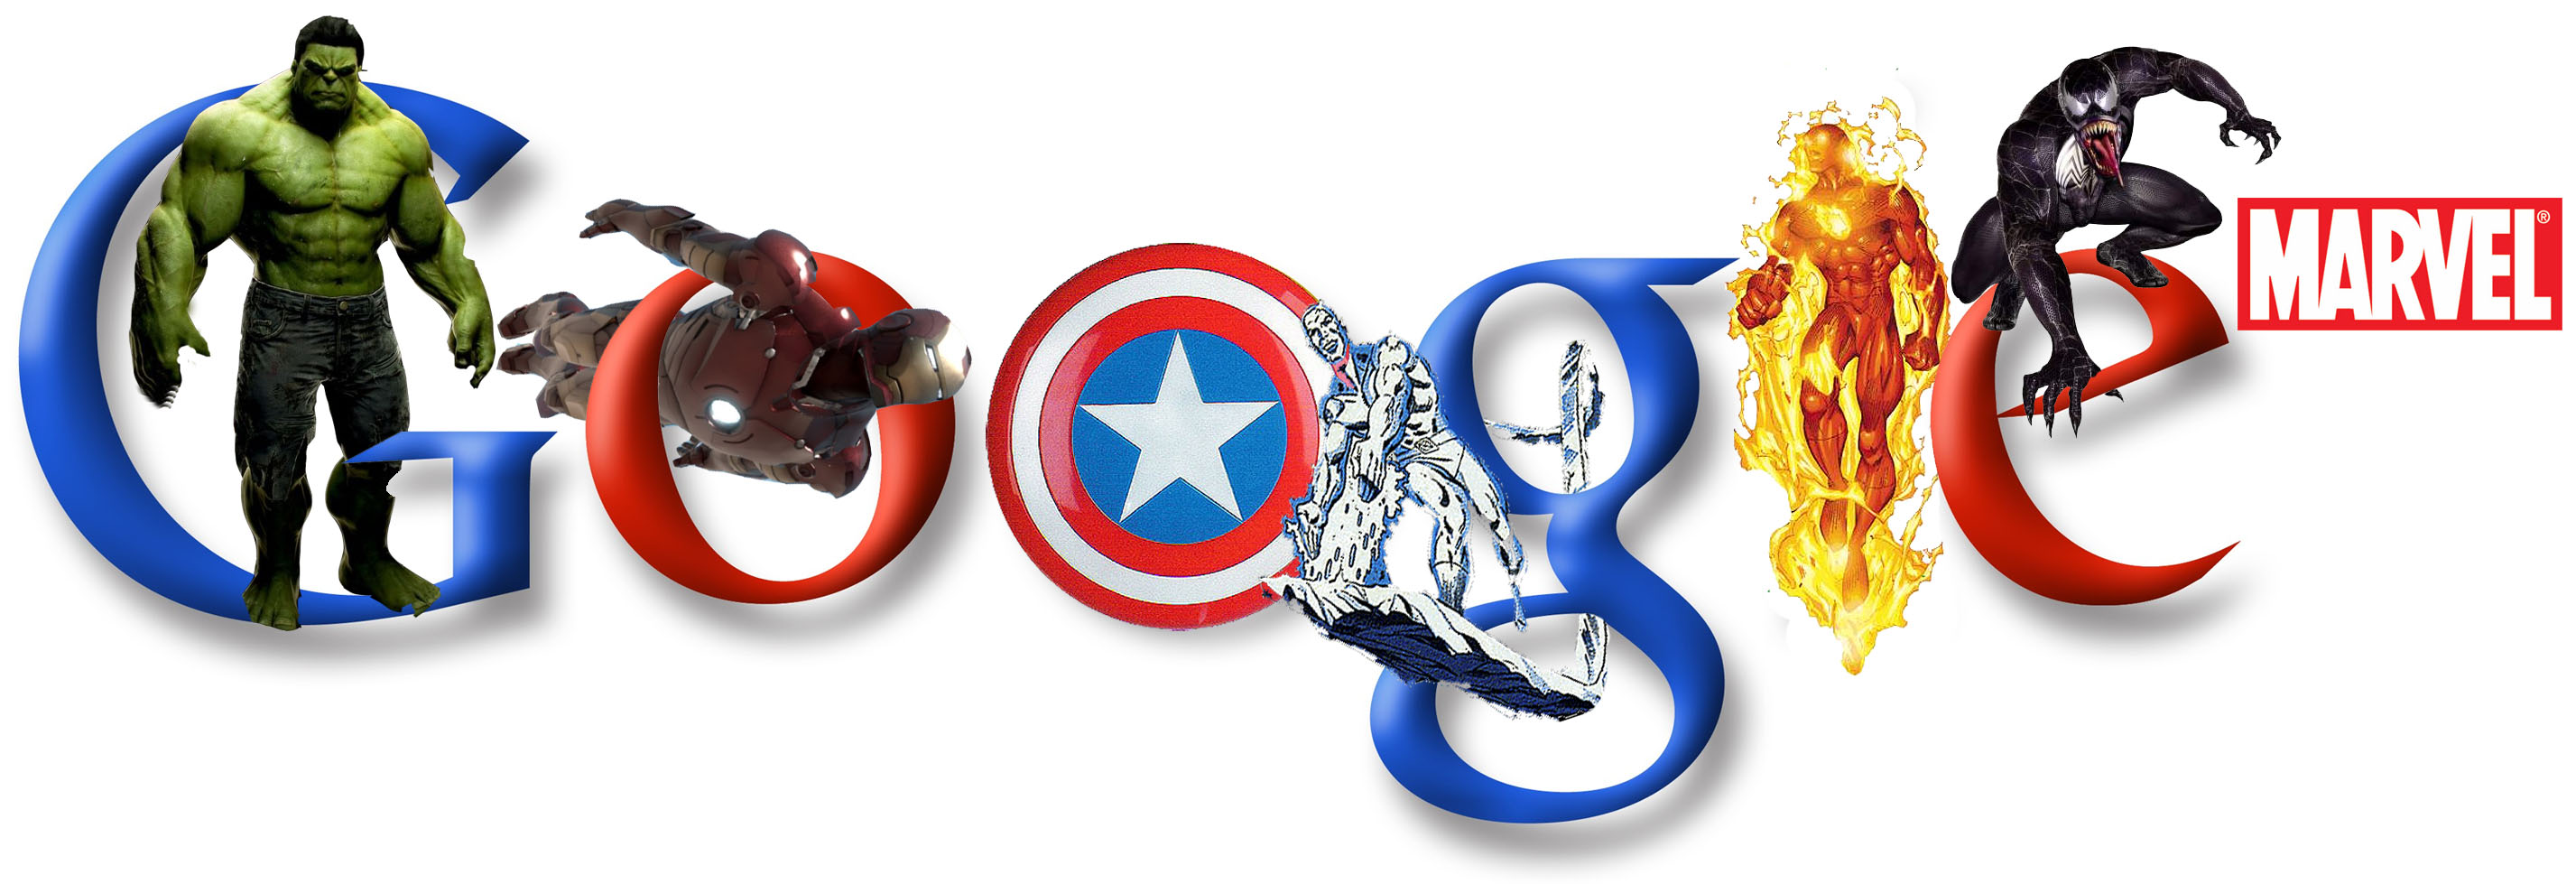 funny google logo logo brands for free hd 3d rh lofrev net funny page logo maker funny logo maker free online